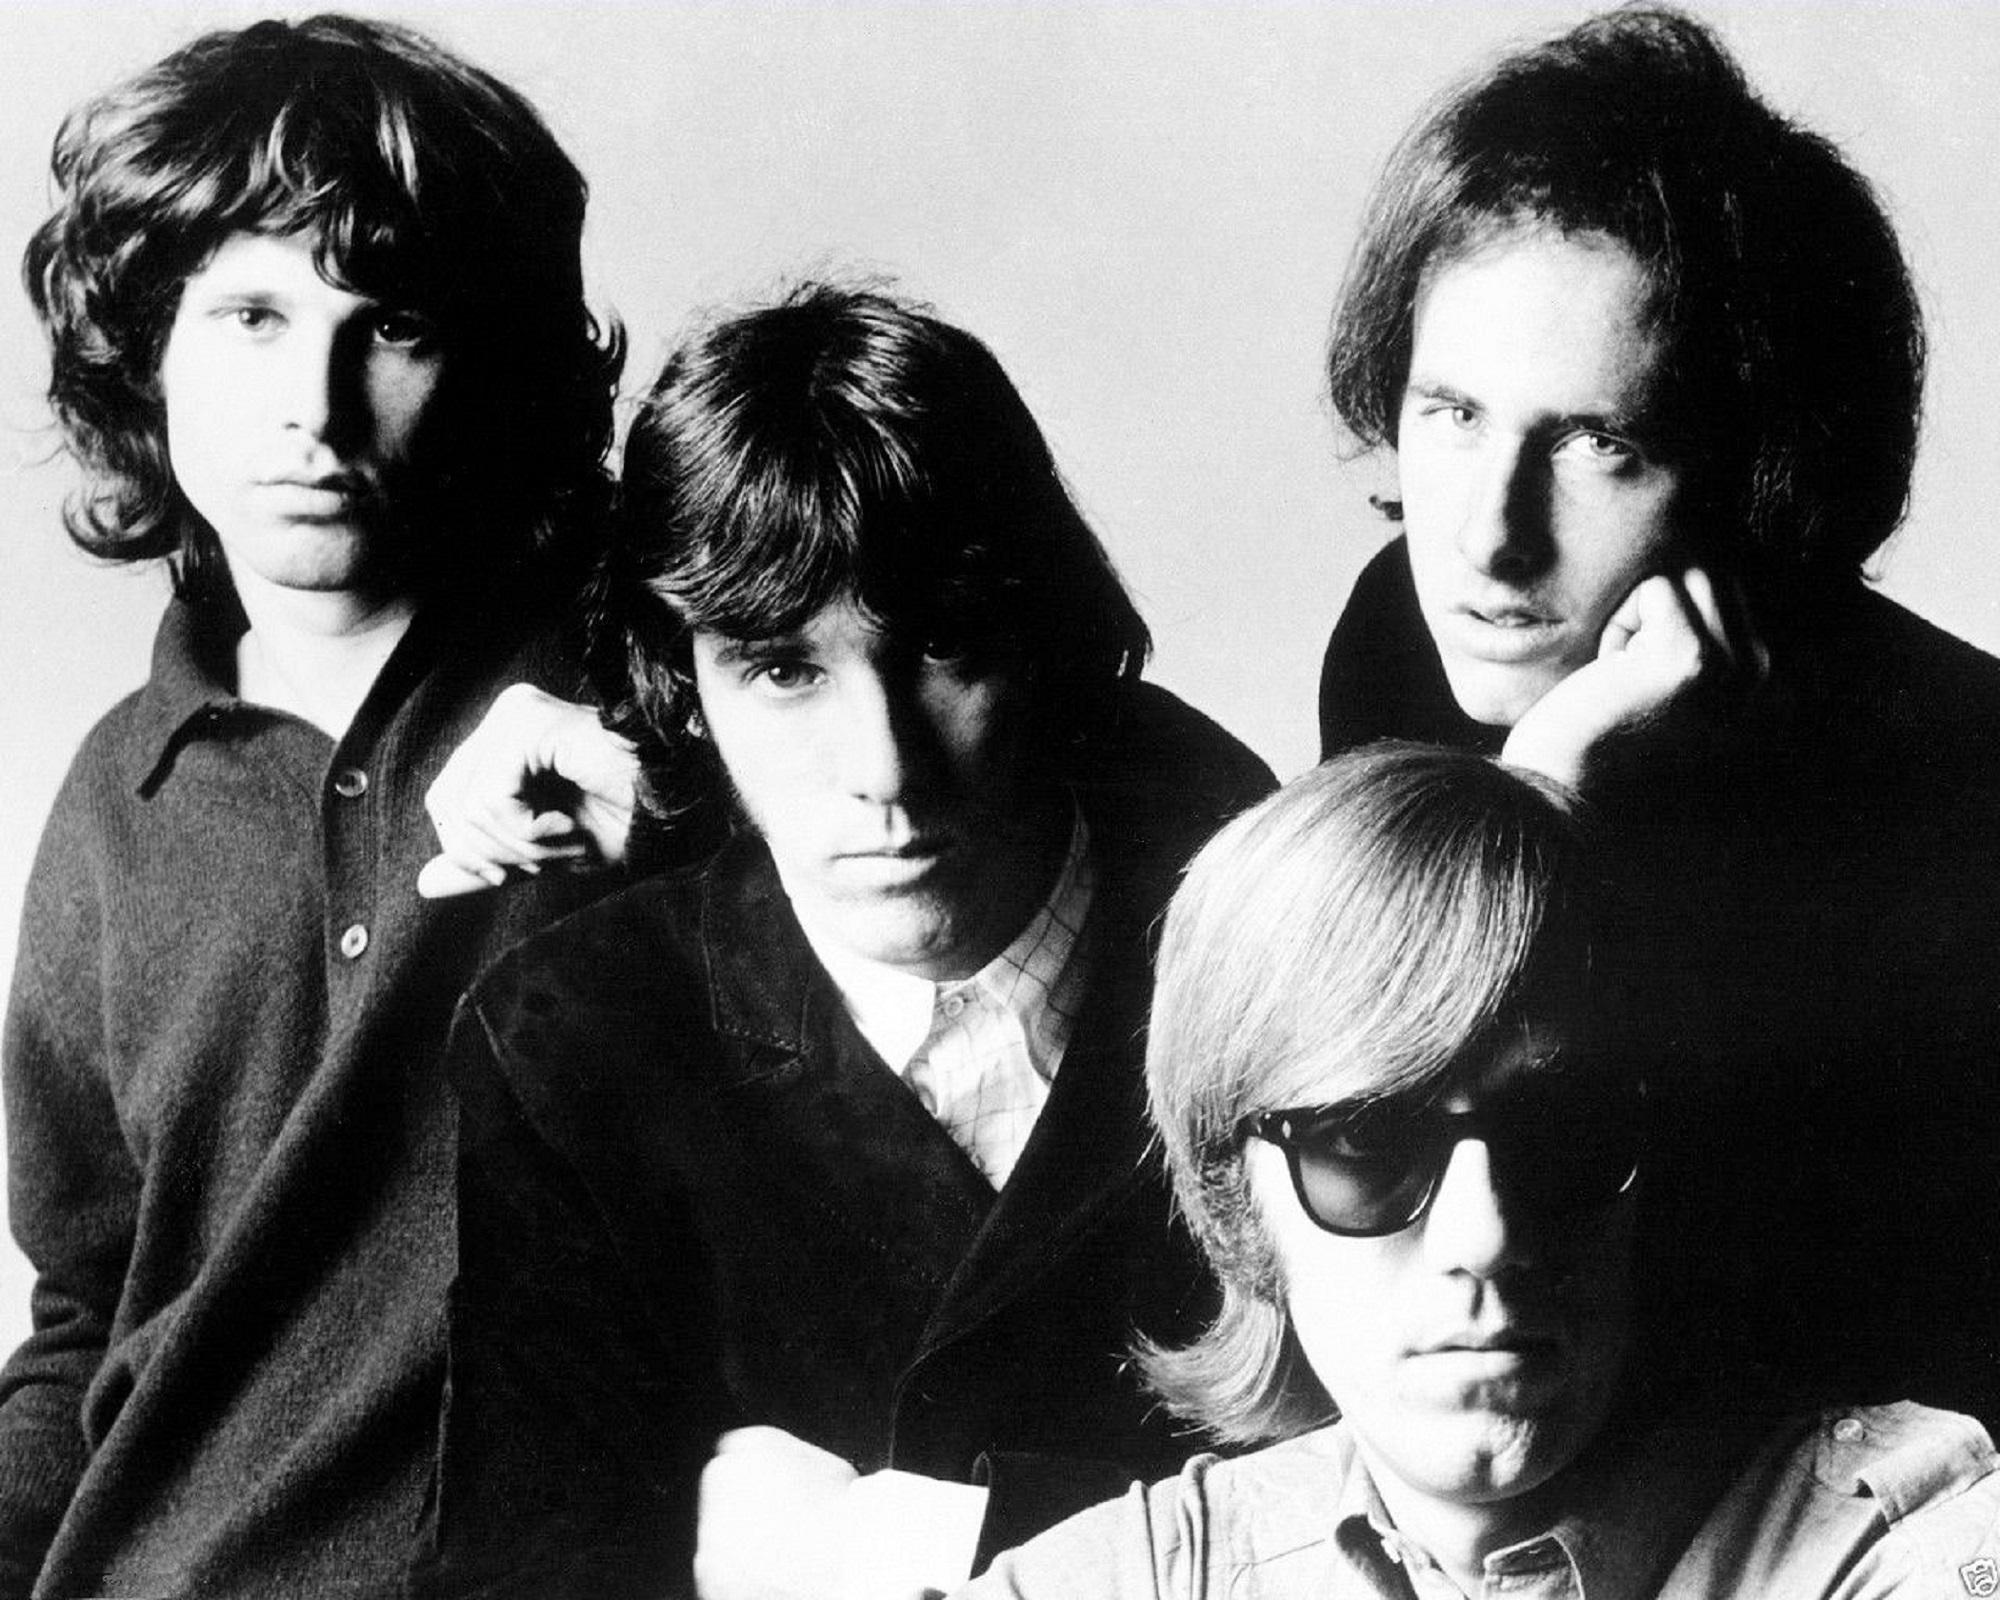 Jim Morrison, Singer, Television, Morrison, Film, HQ Photo